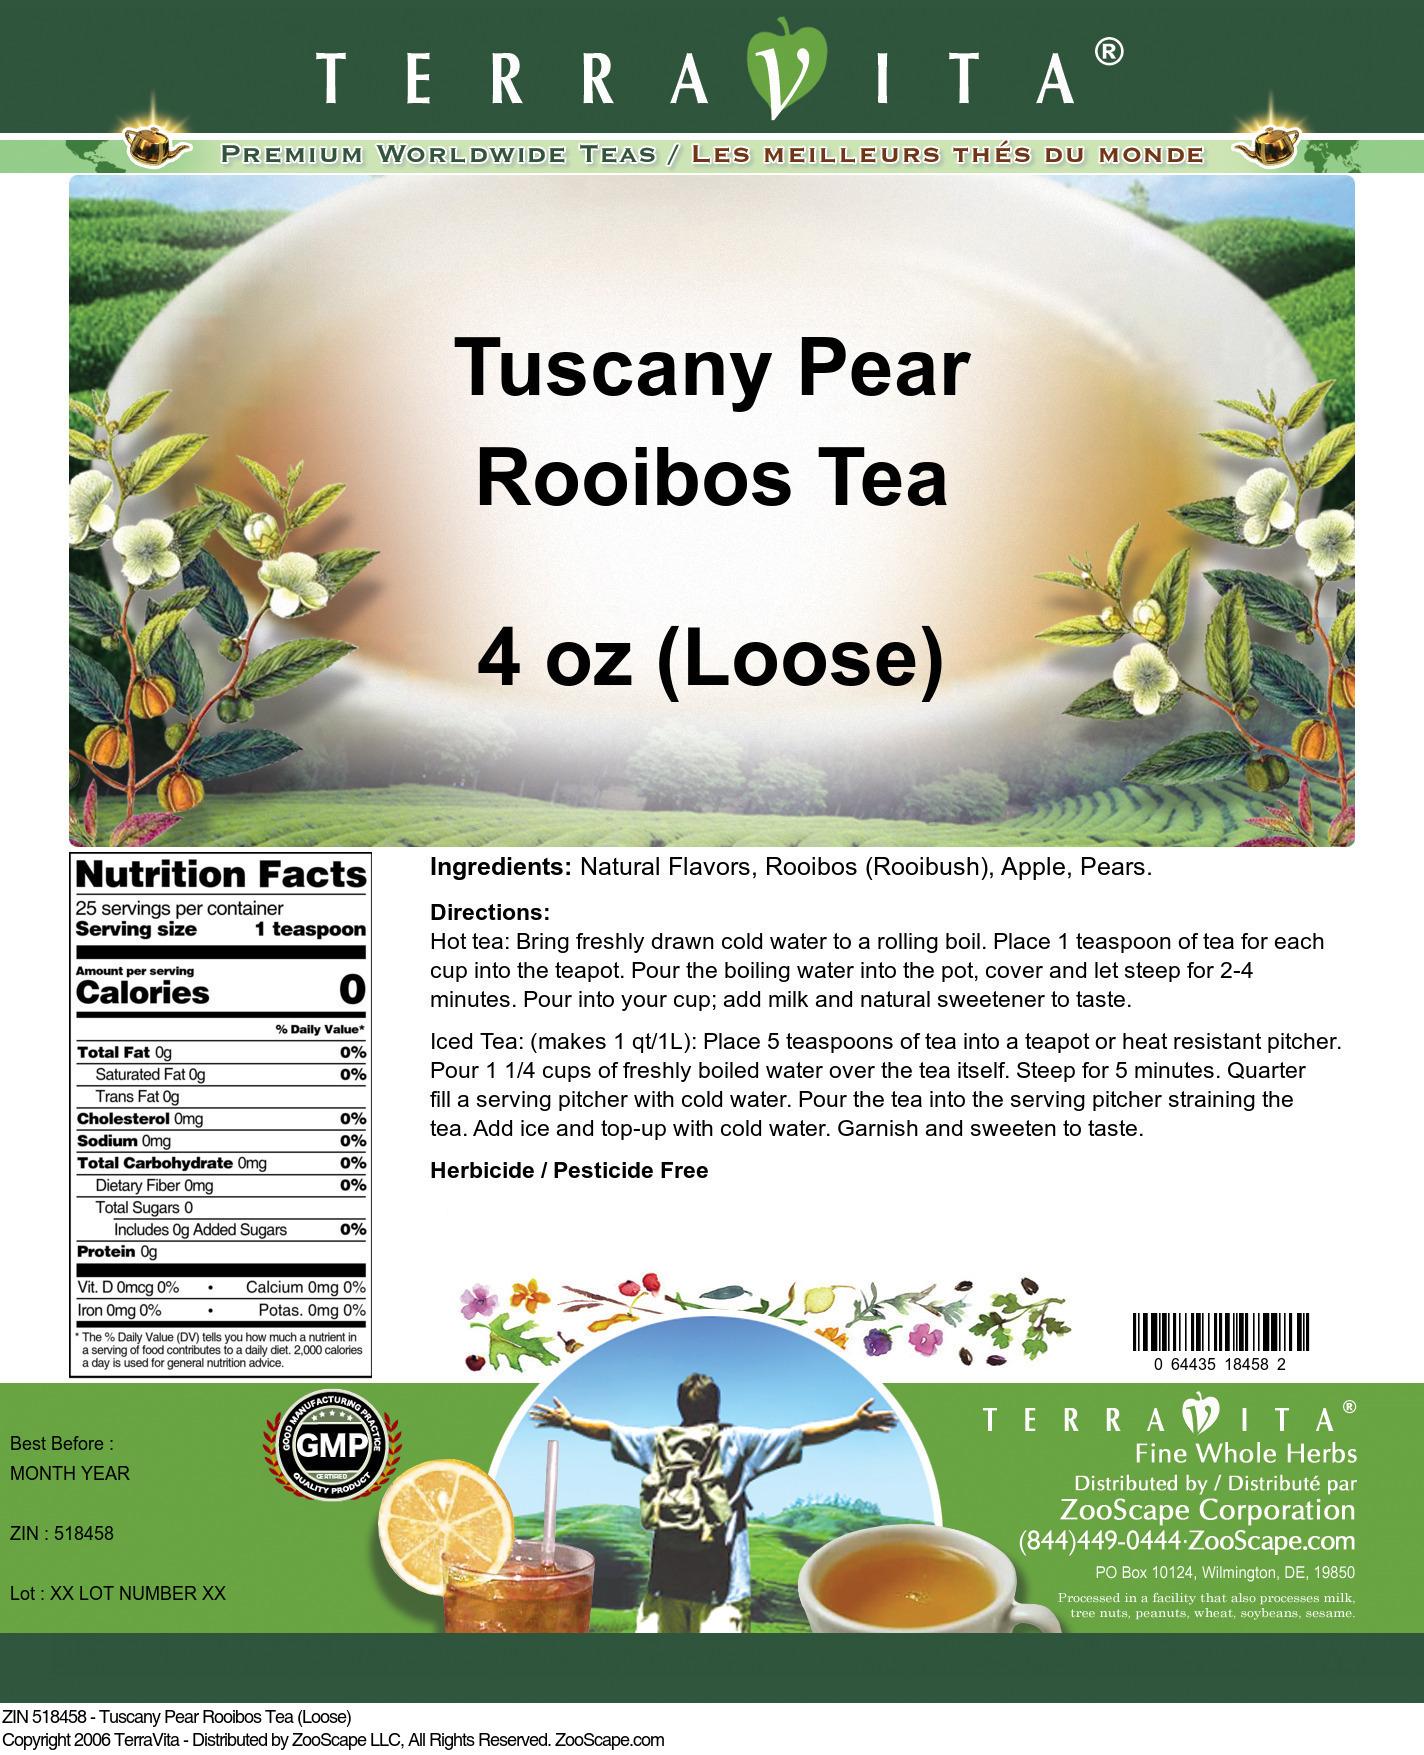 Tuscany Pear Rooibos